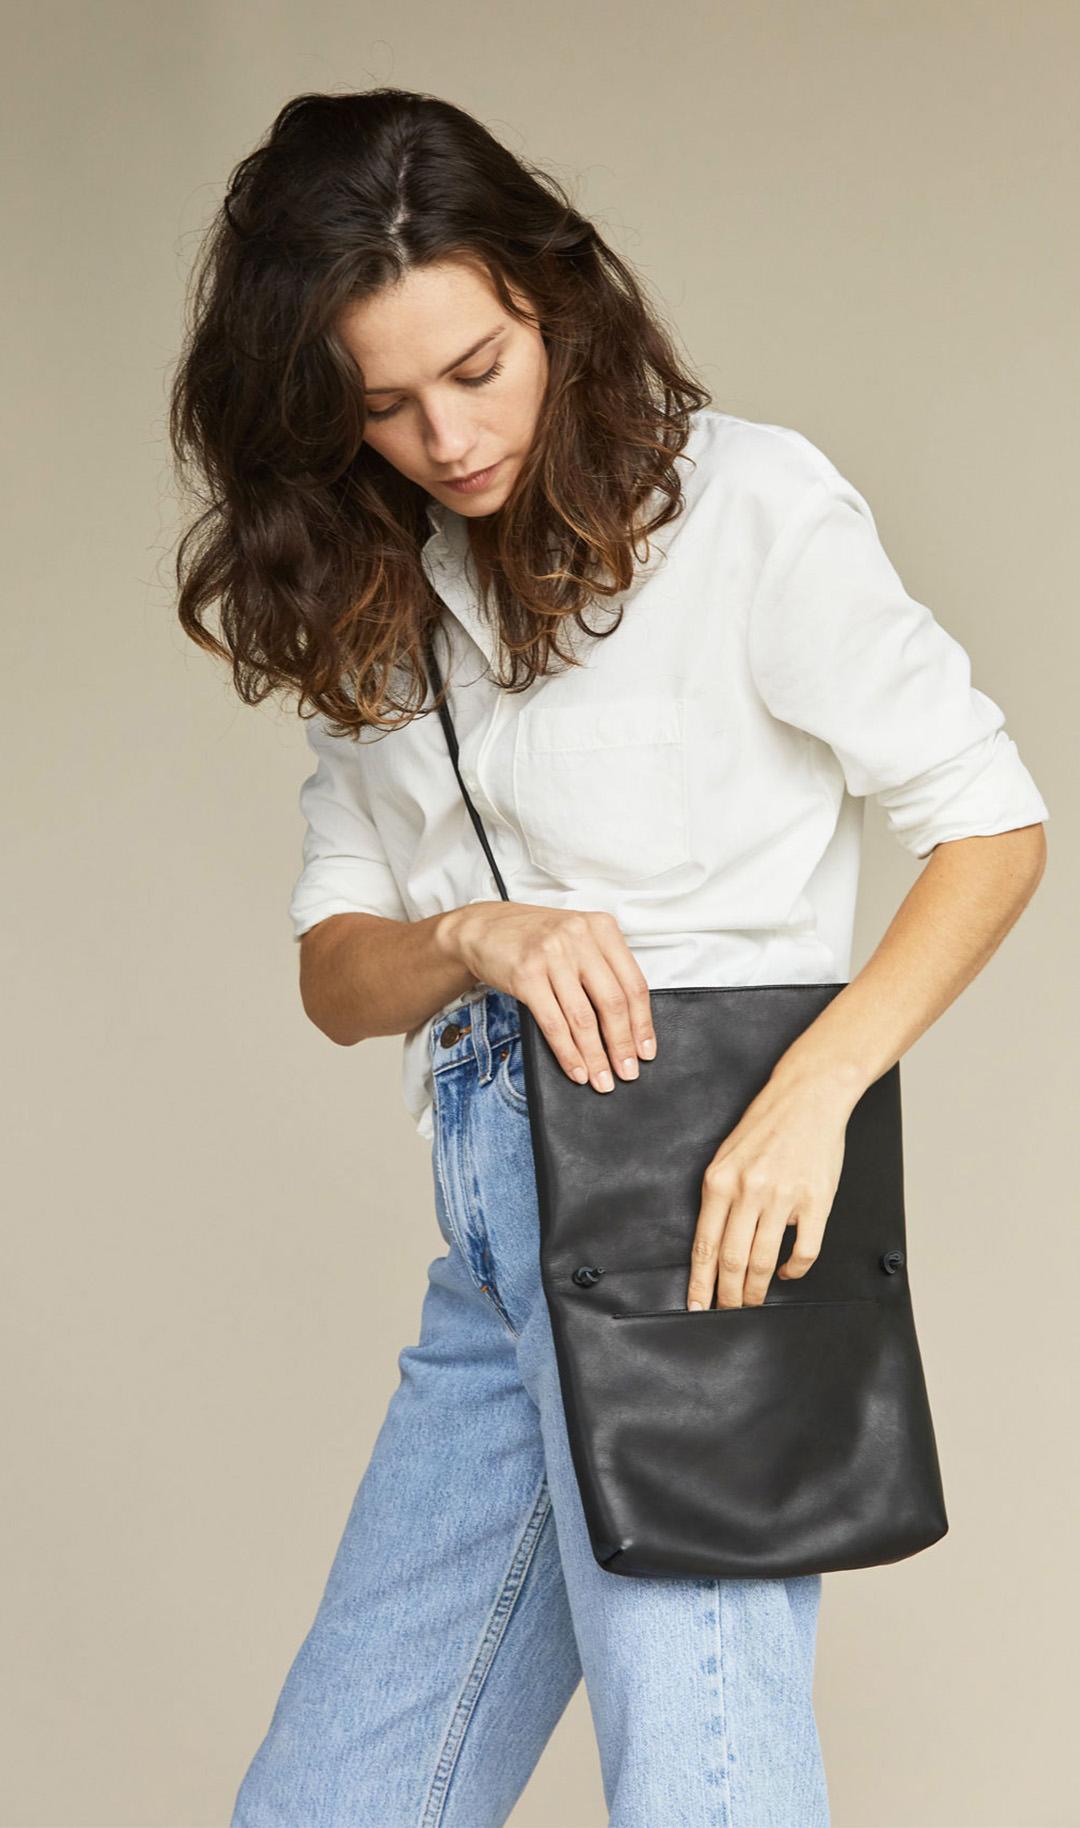 Nisolo Maya Folded Clutch Purse in black